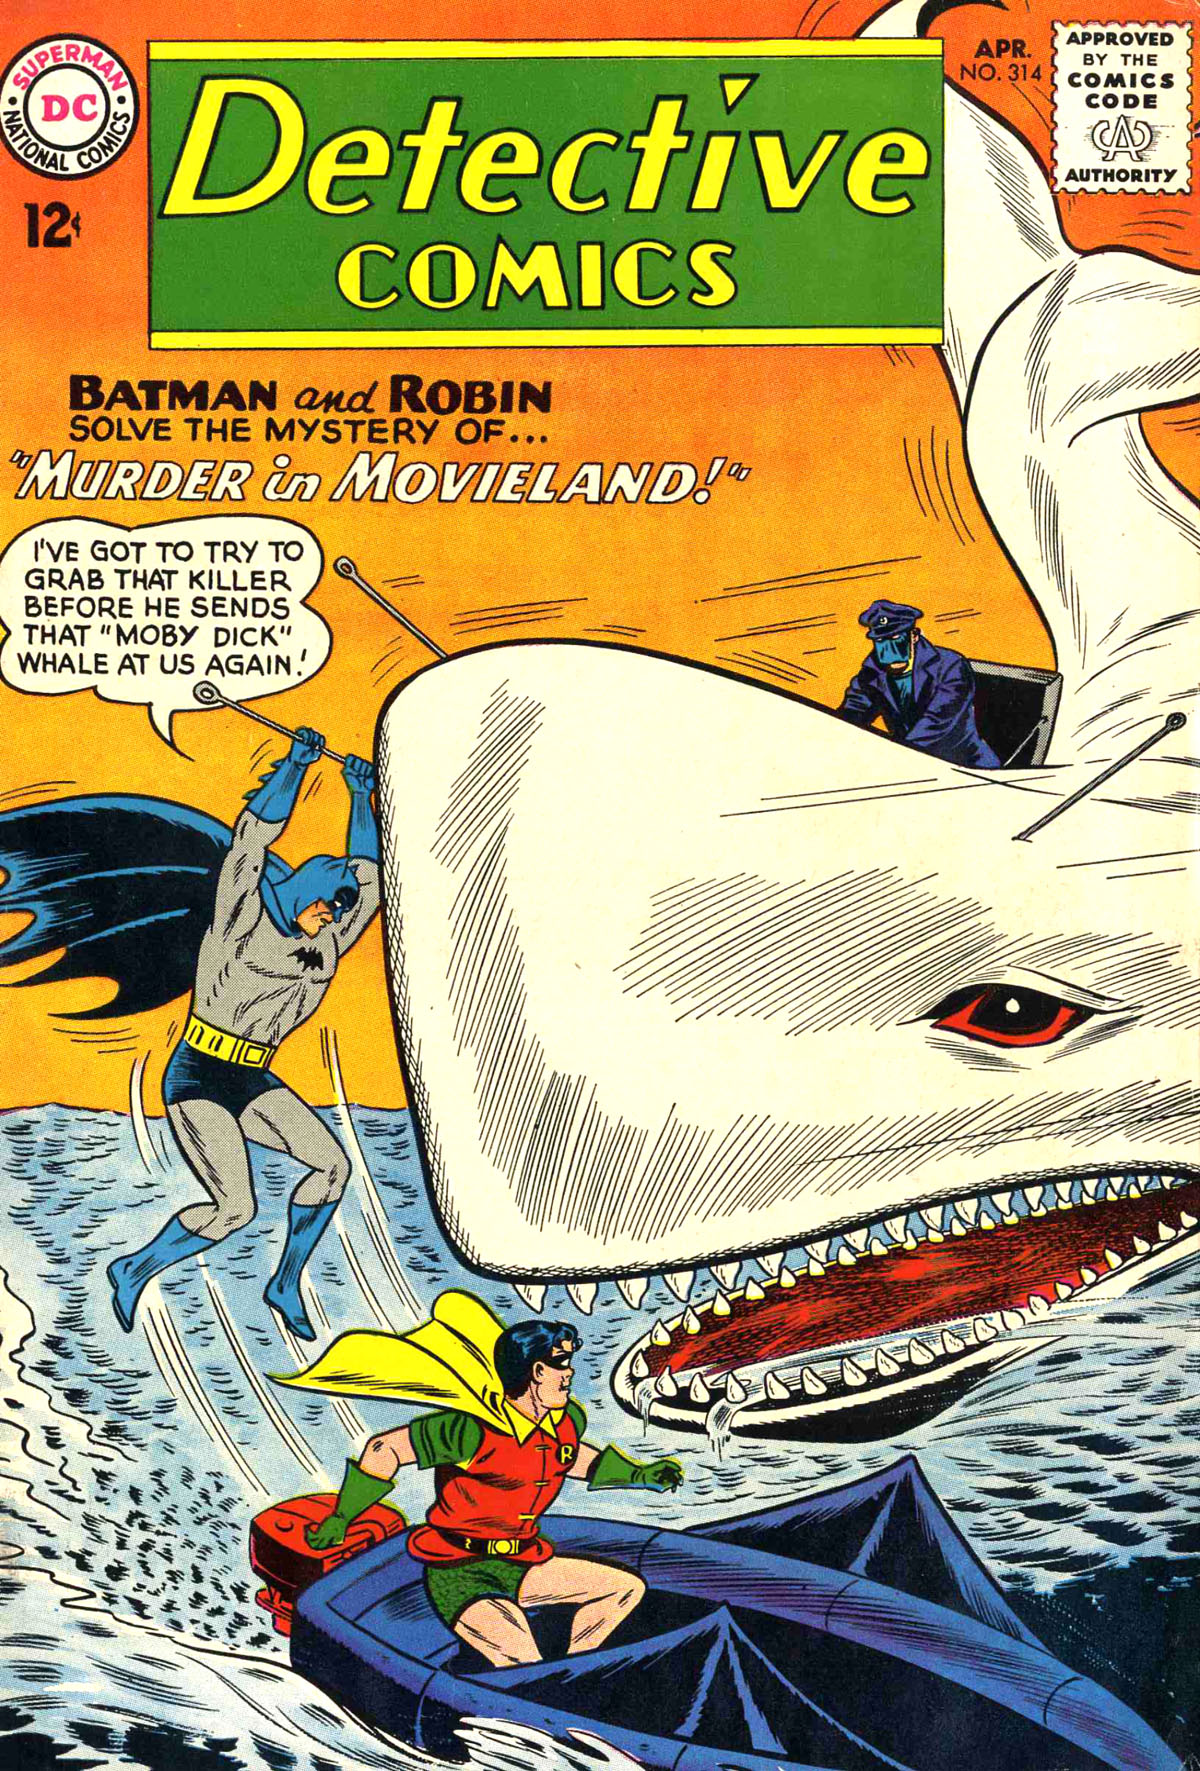 Detective Comics (1937) 314 Page 0